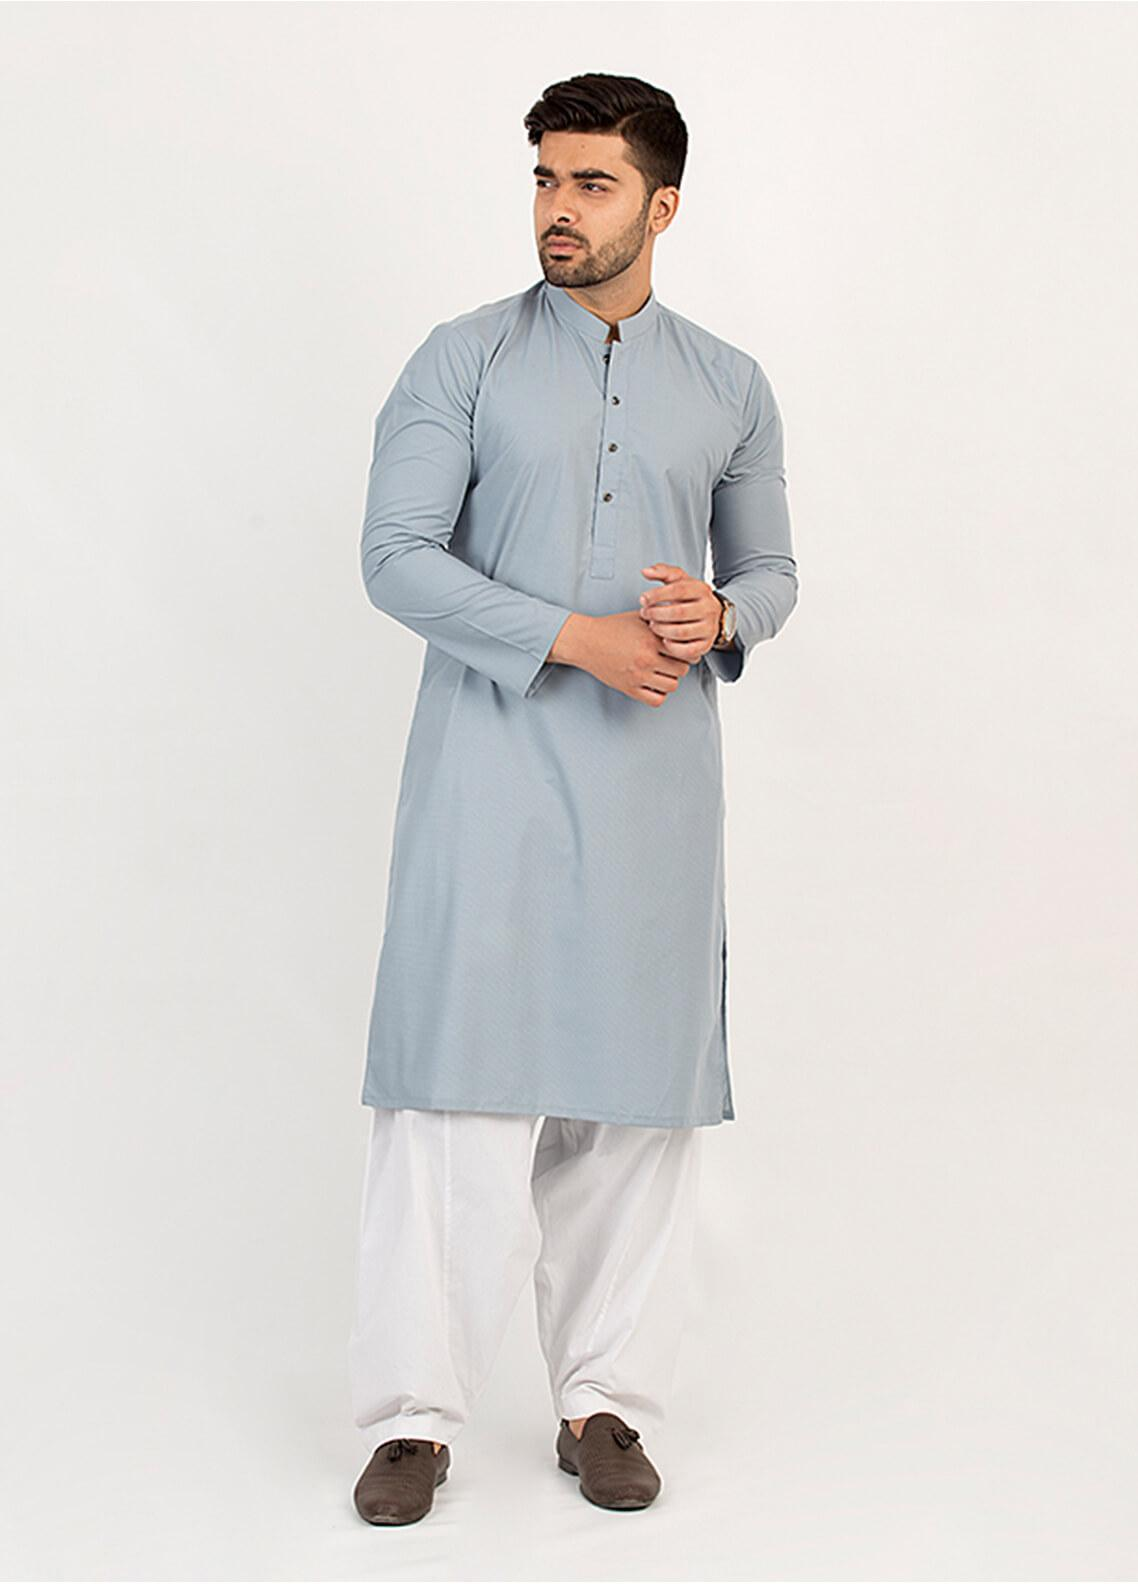 Shahzeb Saeed Wash N Wear Formal Kurta for Men - Grey KURTA-101